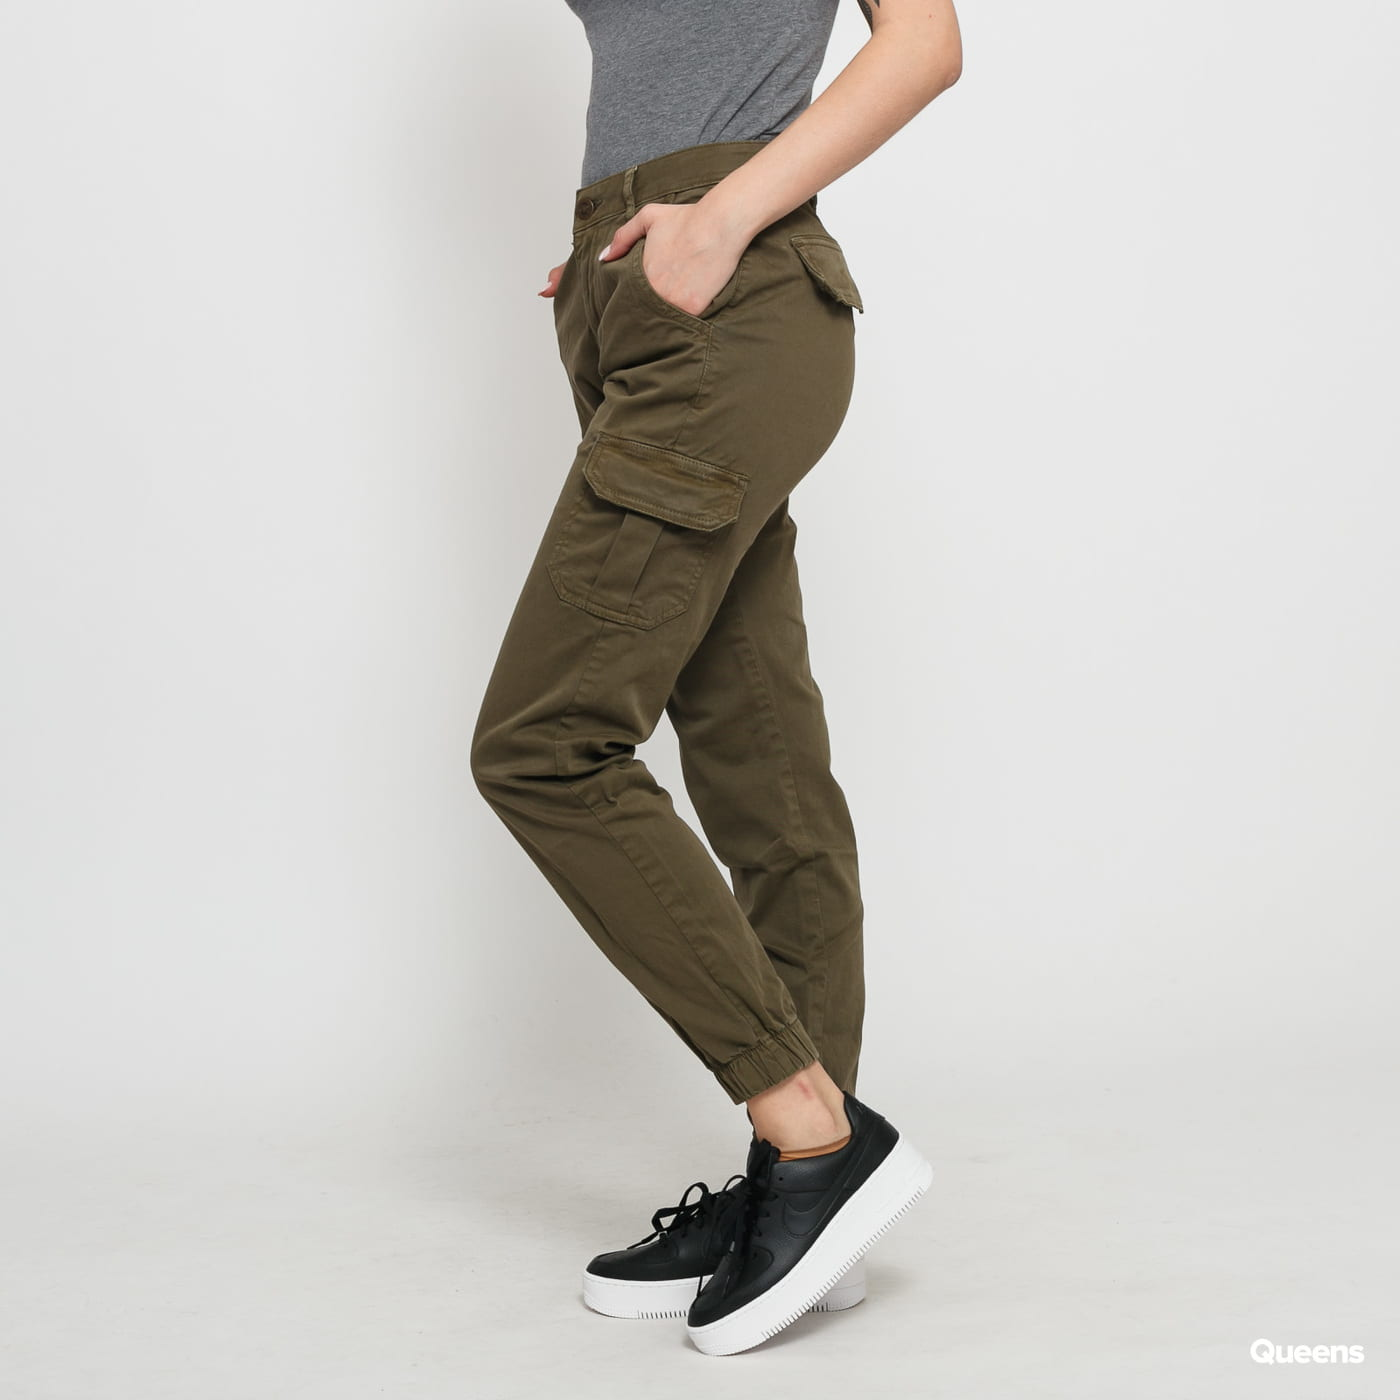 Urban Classics Ladies High Waist Cargo Pants olive